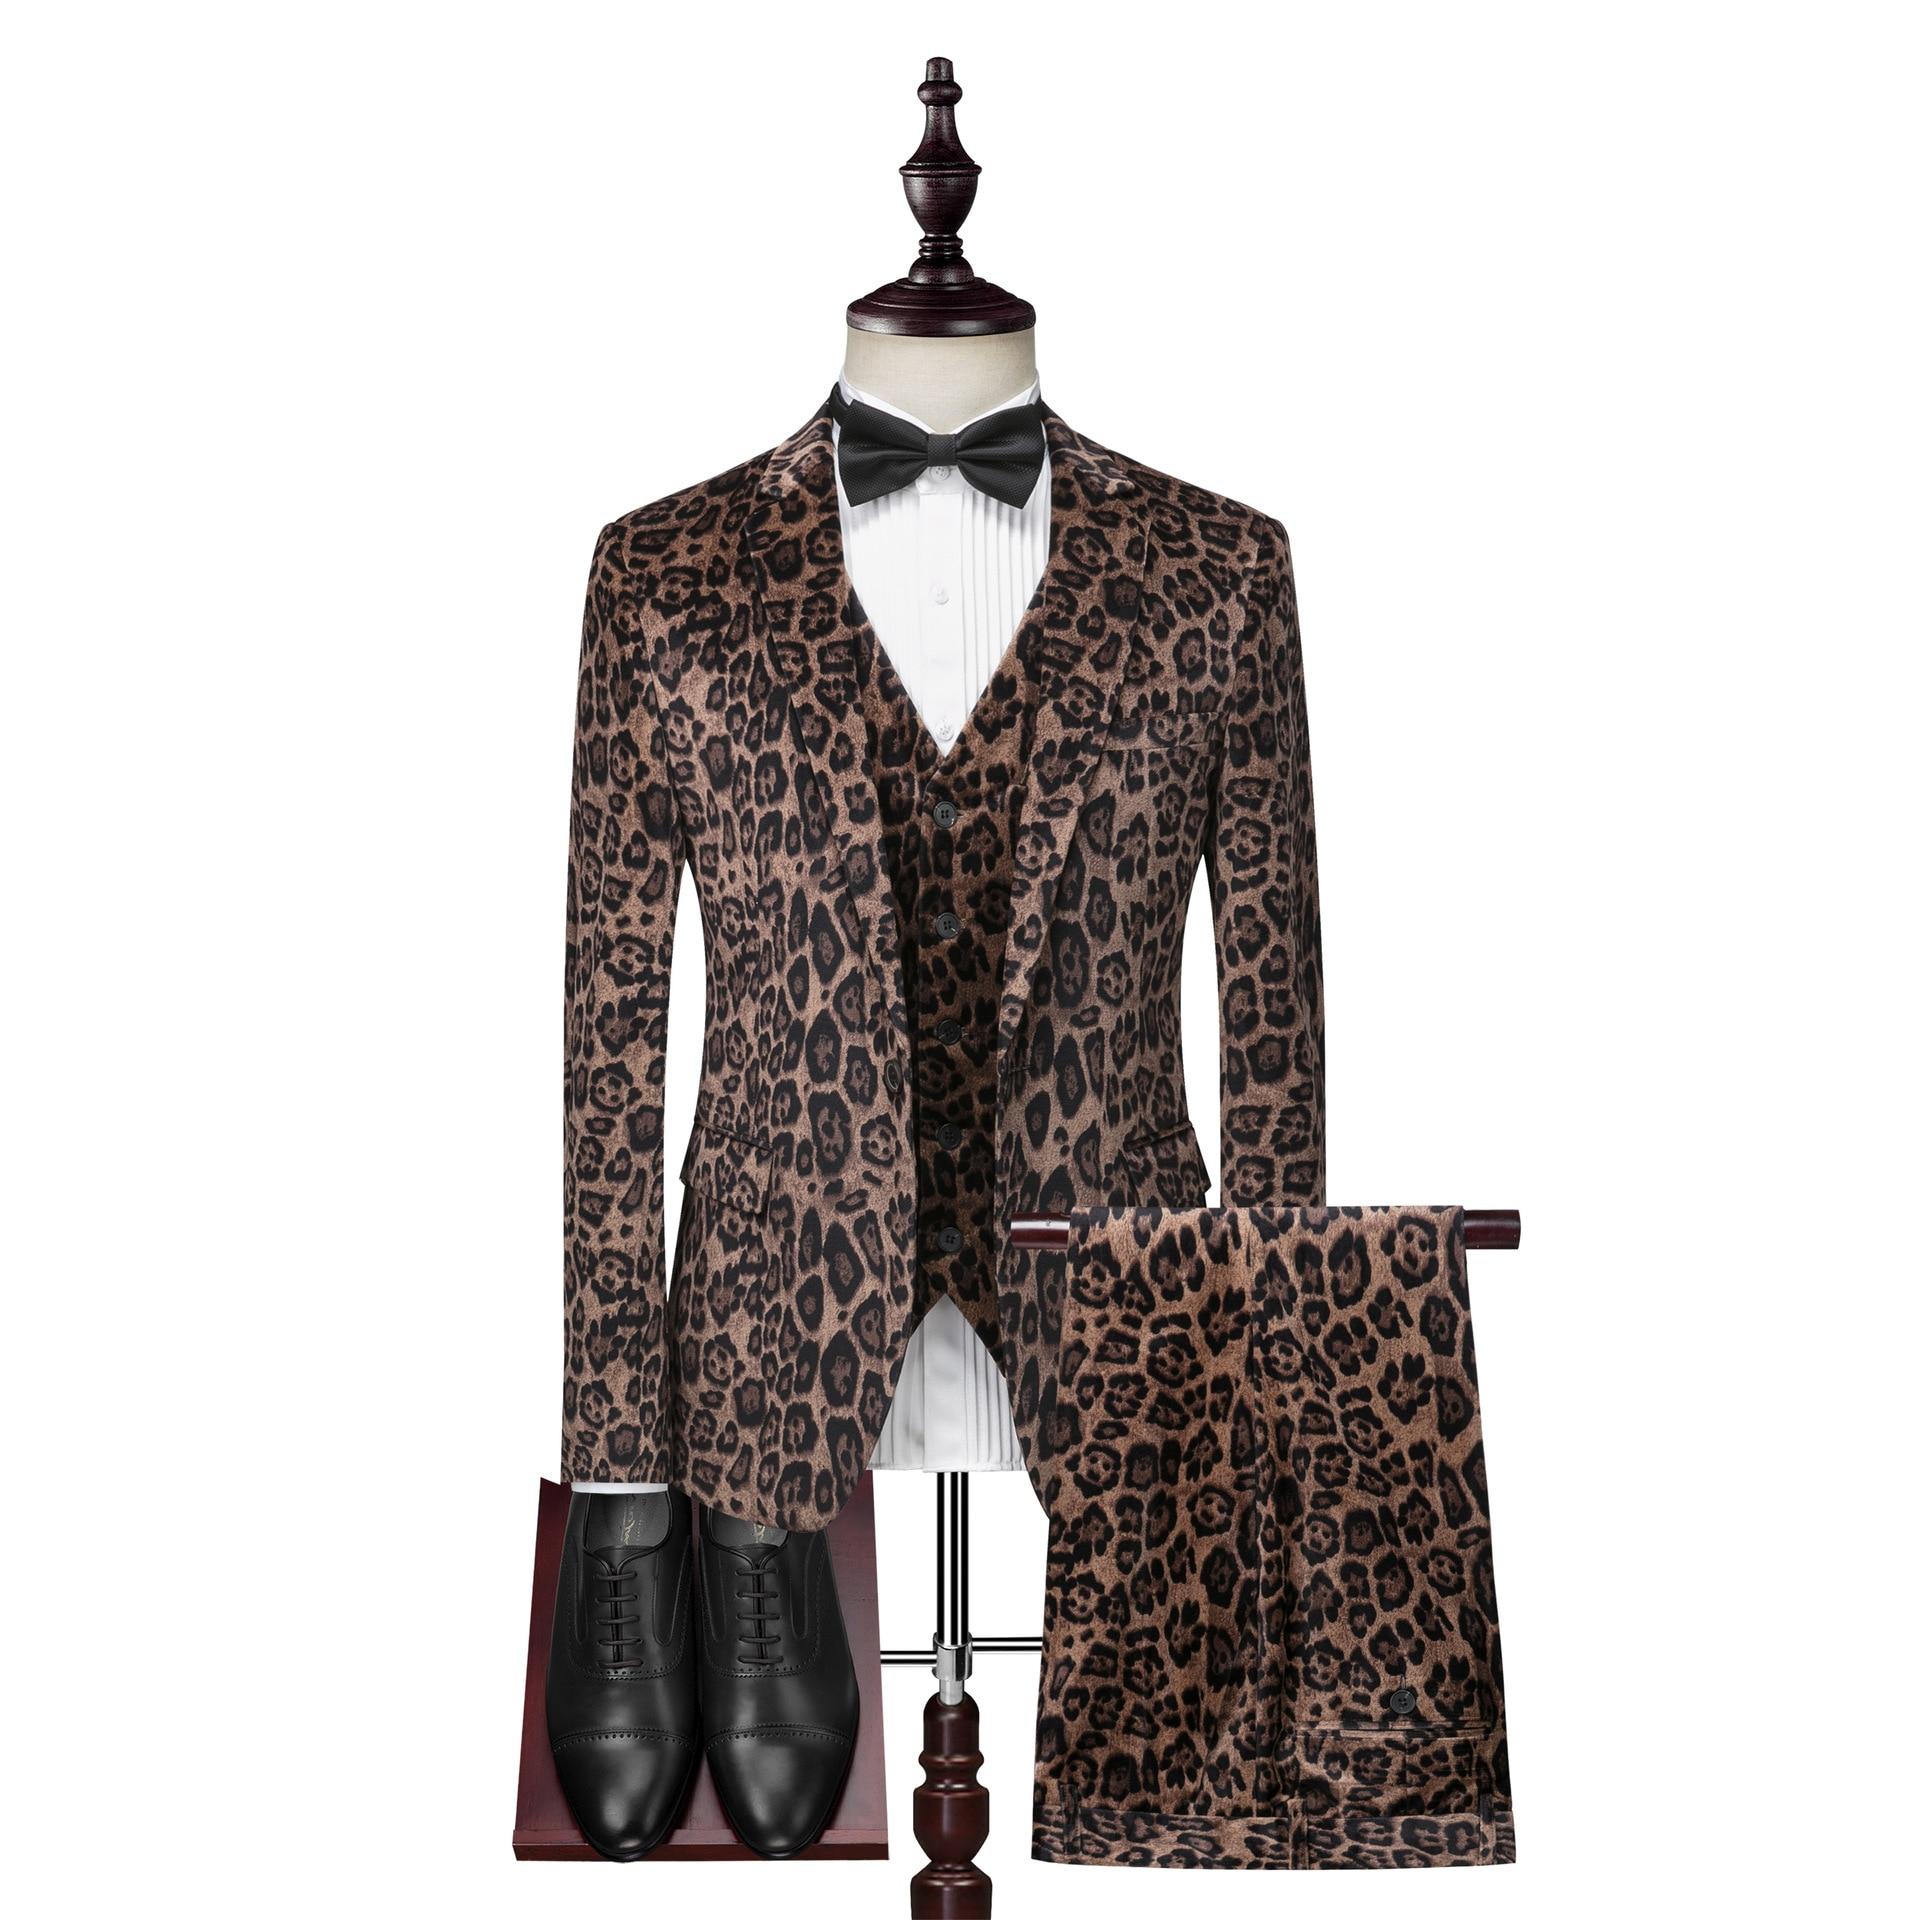 2020 Men Single-Button Suit New Style Leopord Pattern Printing Crafts Velvet Suit Set Three Pieces